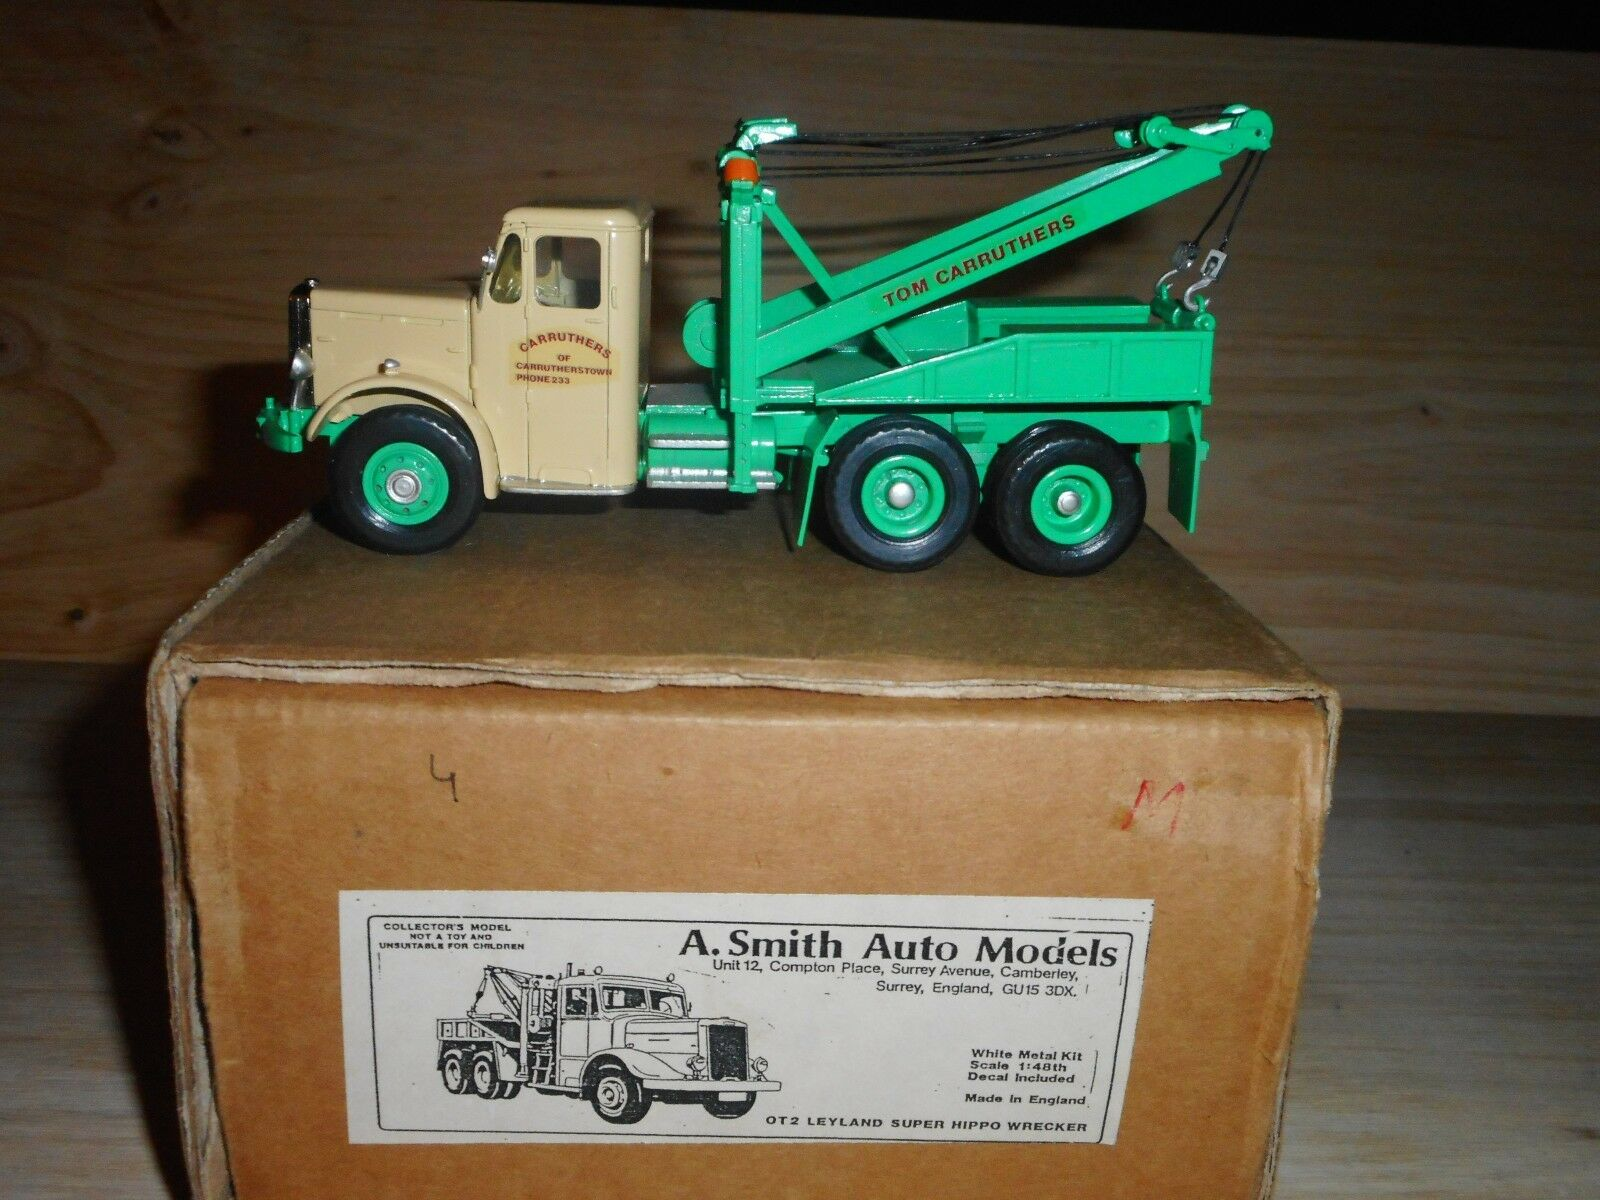 A.SMITH AUTO AUTO AUTO MODELS (  ASAM ) leyland super hippo wracker  kit métal monté 1/48   New Style,En Ligne  3d005b